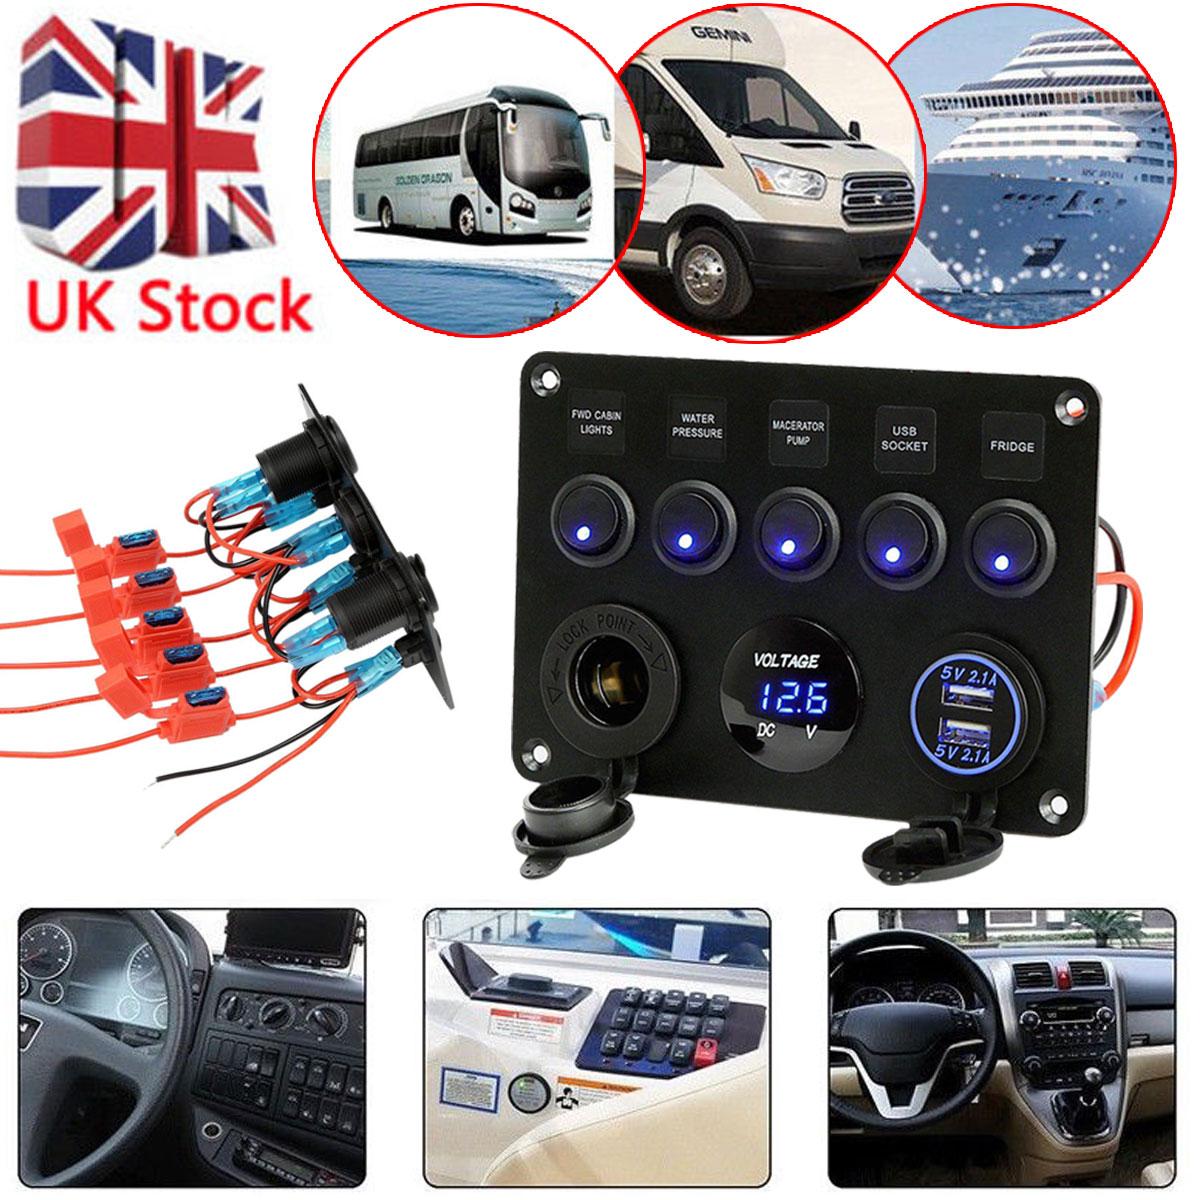 Inline Fuse Circuit Breaker Led Rocker Switch Panel Usb Charger Port Car Box 2 Socket Boat 12 24v Dc